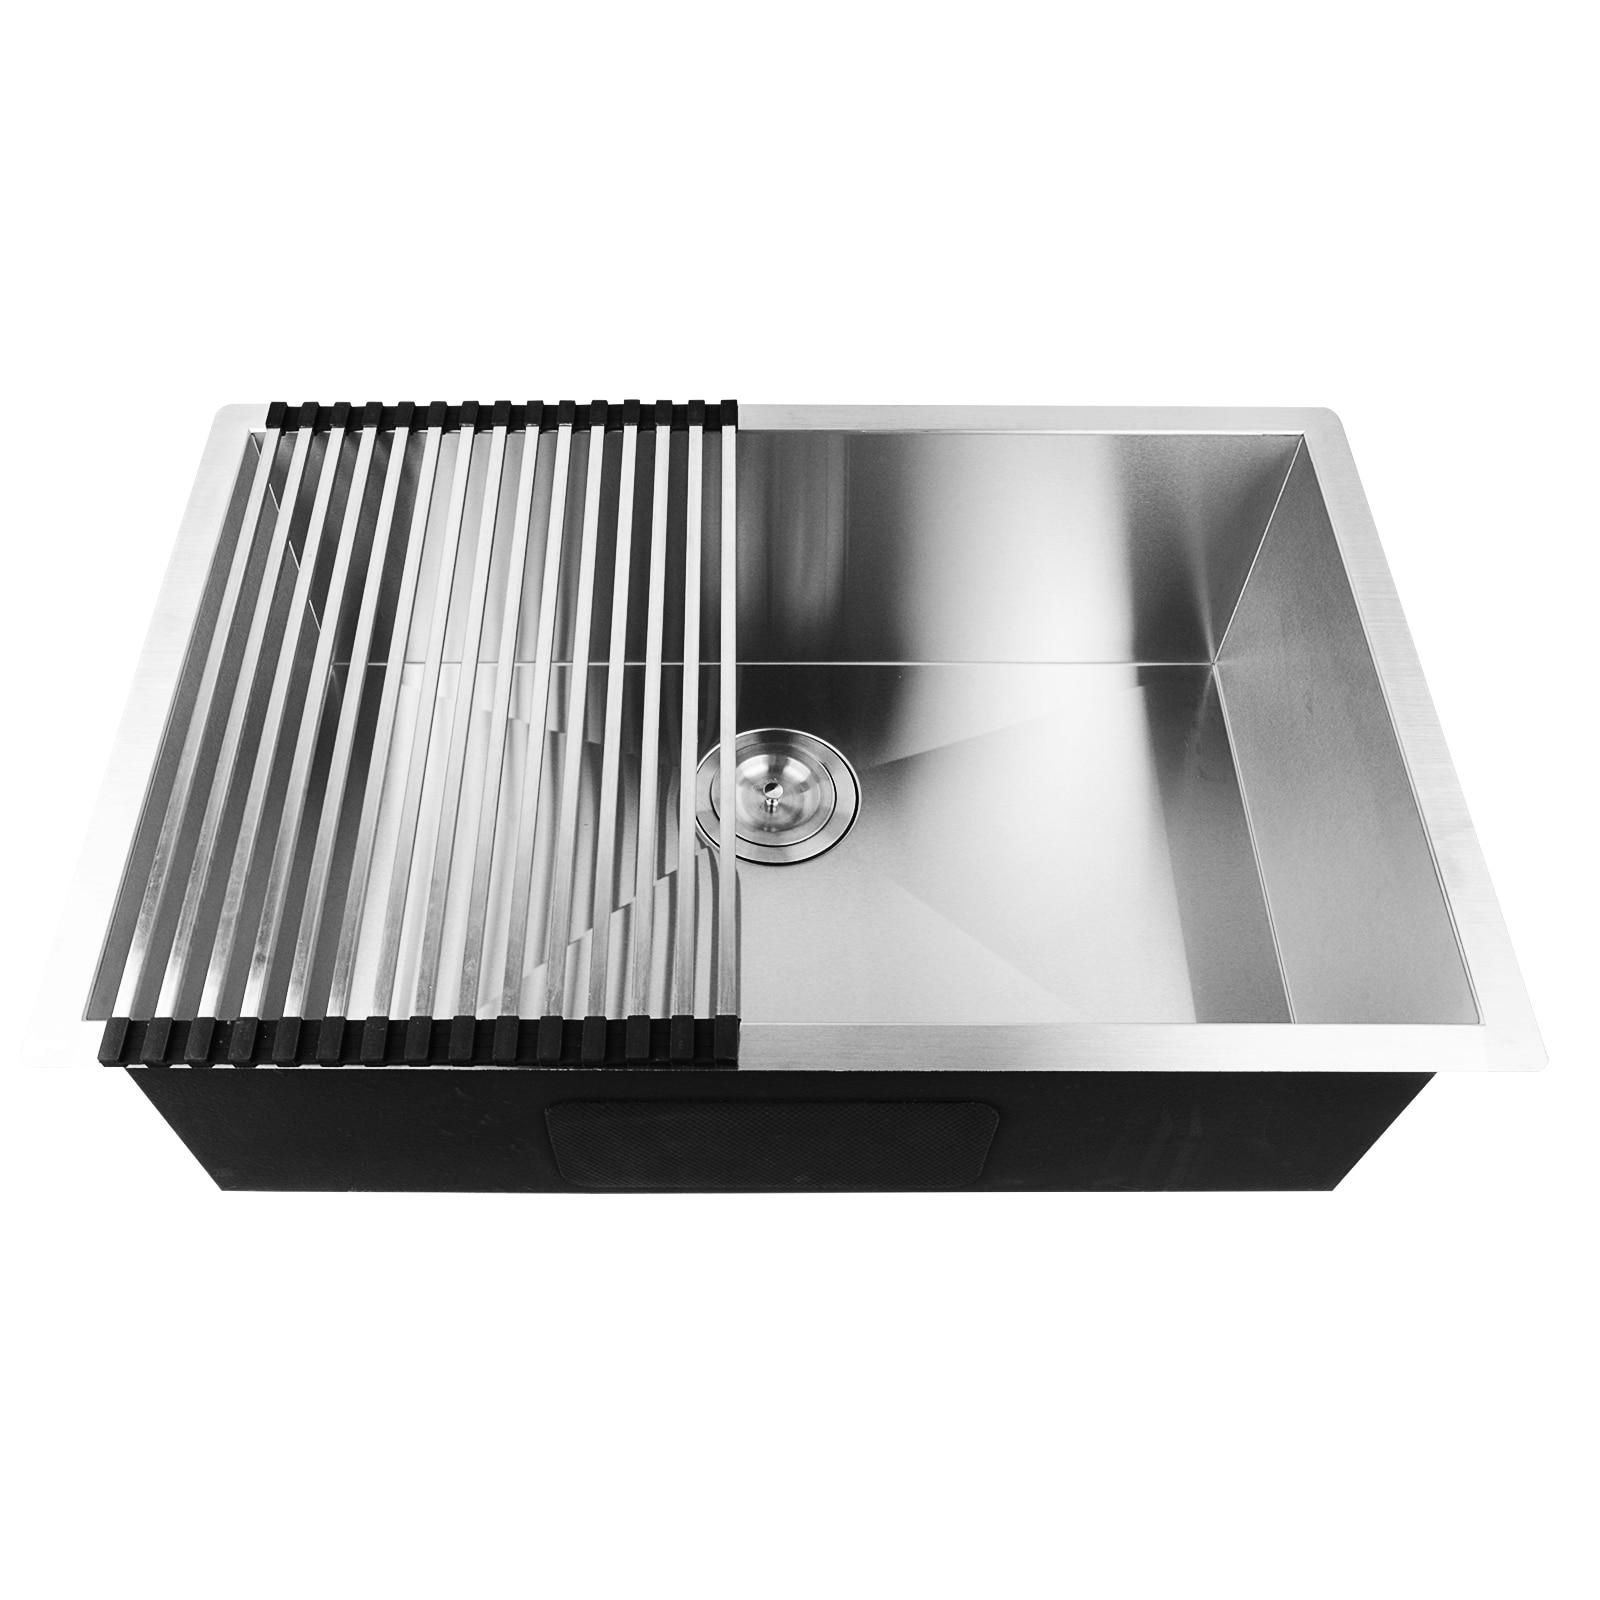 все цены на Commercial Stainless Steel Single Bowl Kitchen Sink Undermount 19 Gauge Kitchen waste stopper floor drain MAYITR